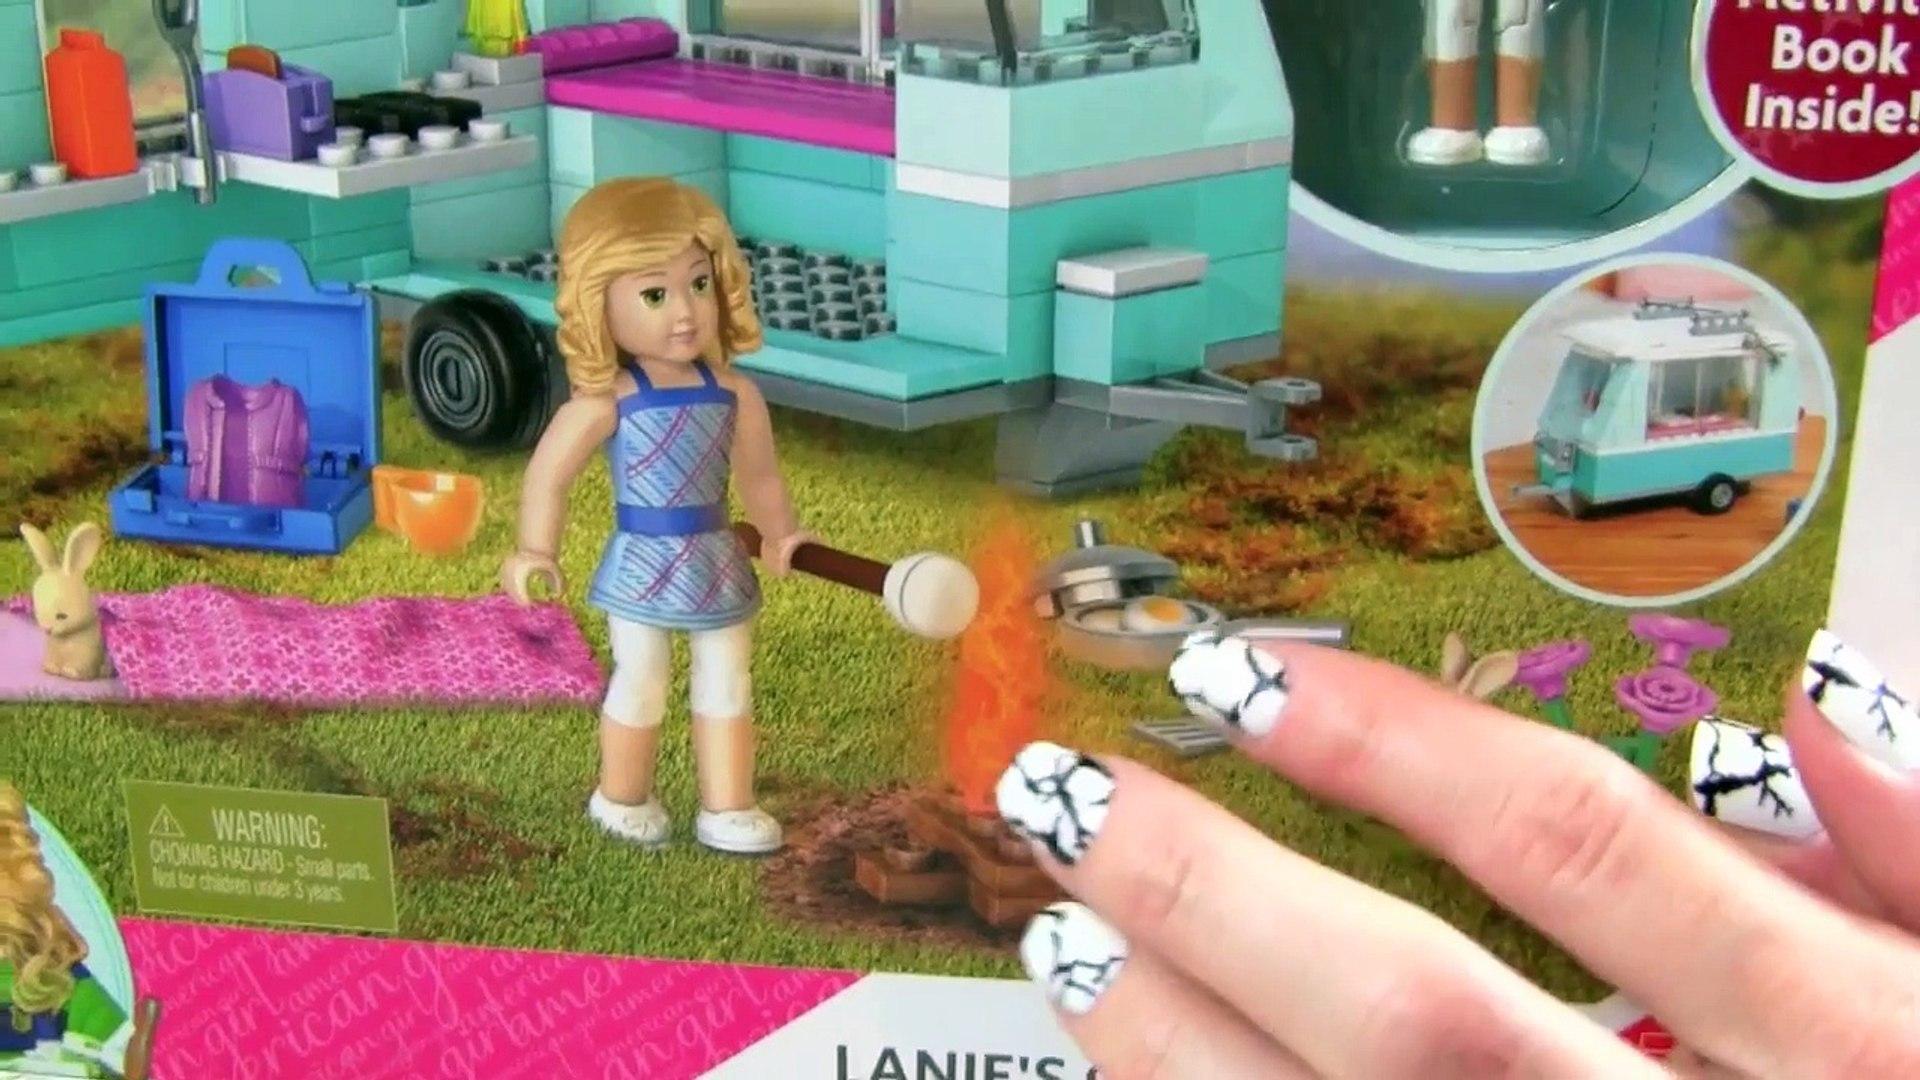 American Girl Mega Bloks Lanies Camping Trip! LIKE LEGOS! NEW 2016 American Girl Mega Construx